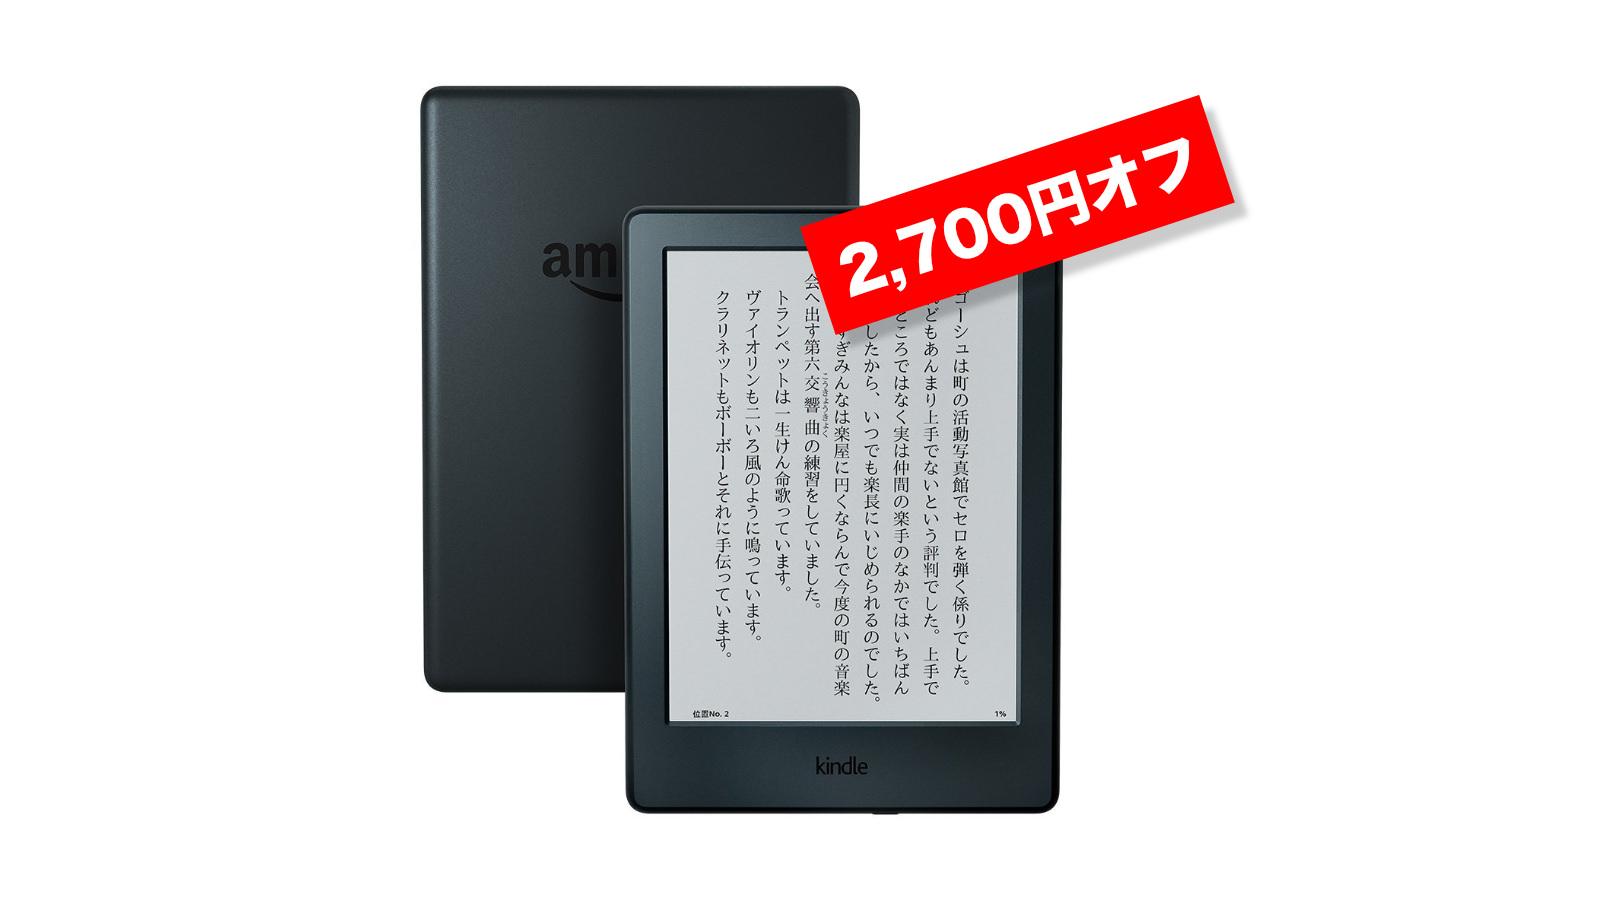 Kindle-on-sale-Timesale-April.jpg